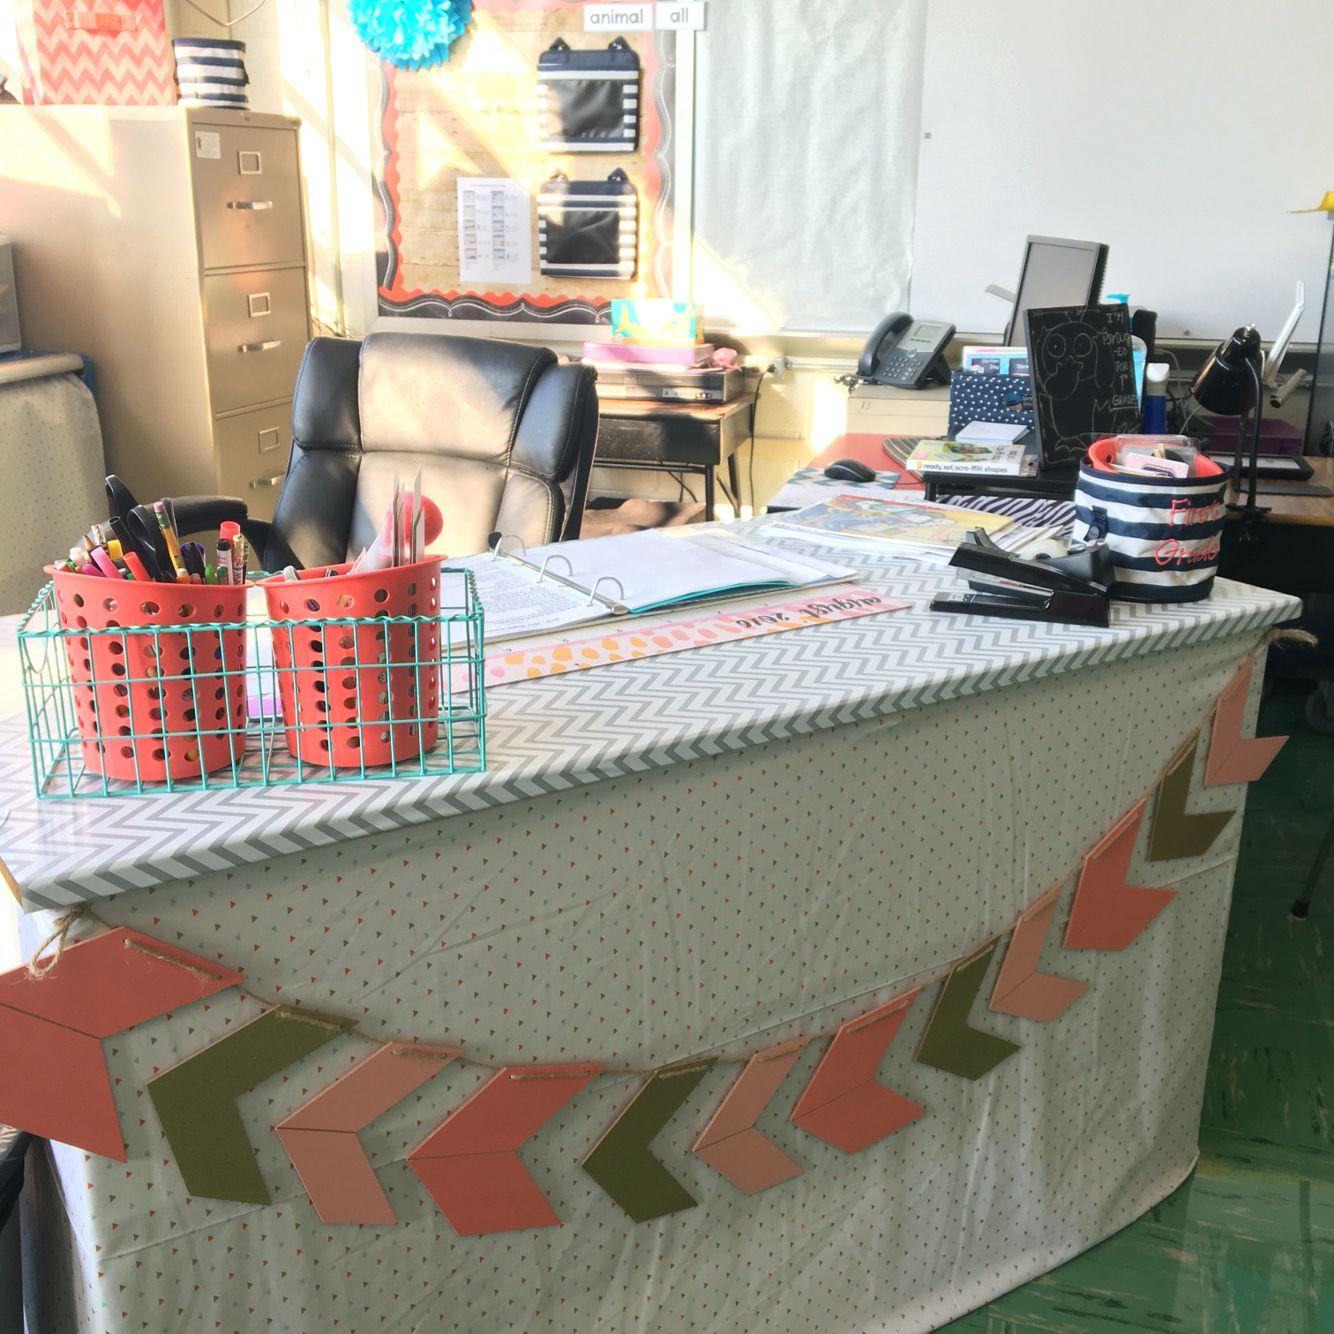 decor deskwork proven pinterest design crafty for collection diy desk strategies lady classroom of area ideas the images teacher organization